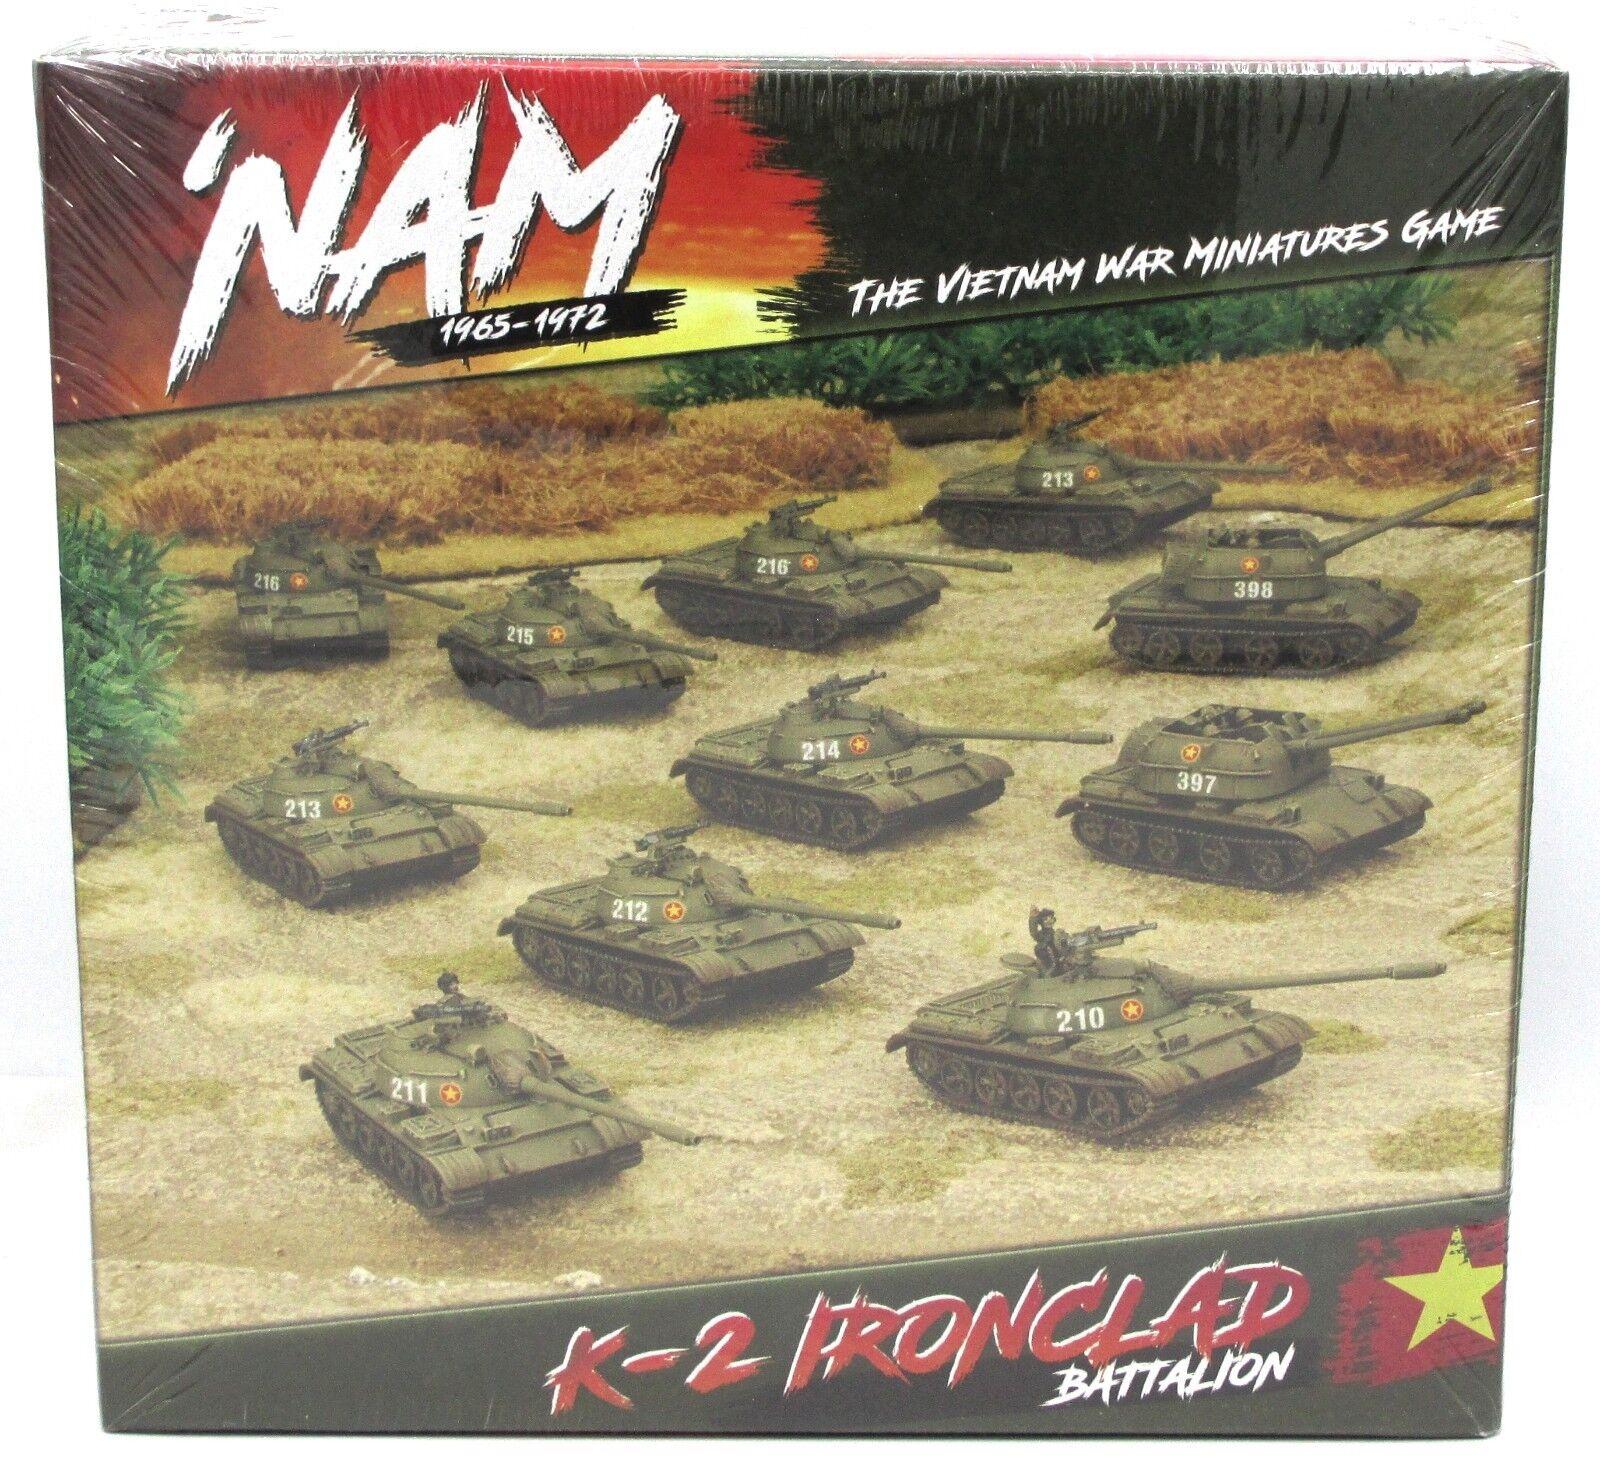 Nam vpaab01 pavn 2 blütenrein bataillon nordvietnamesen armee sich vietnam - krieg